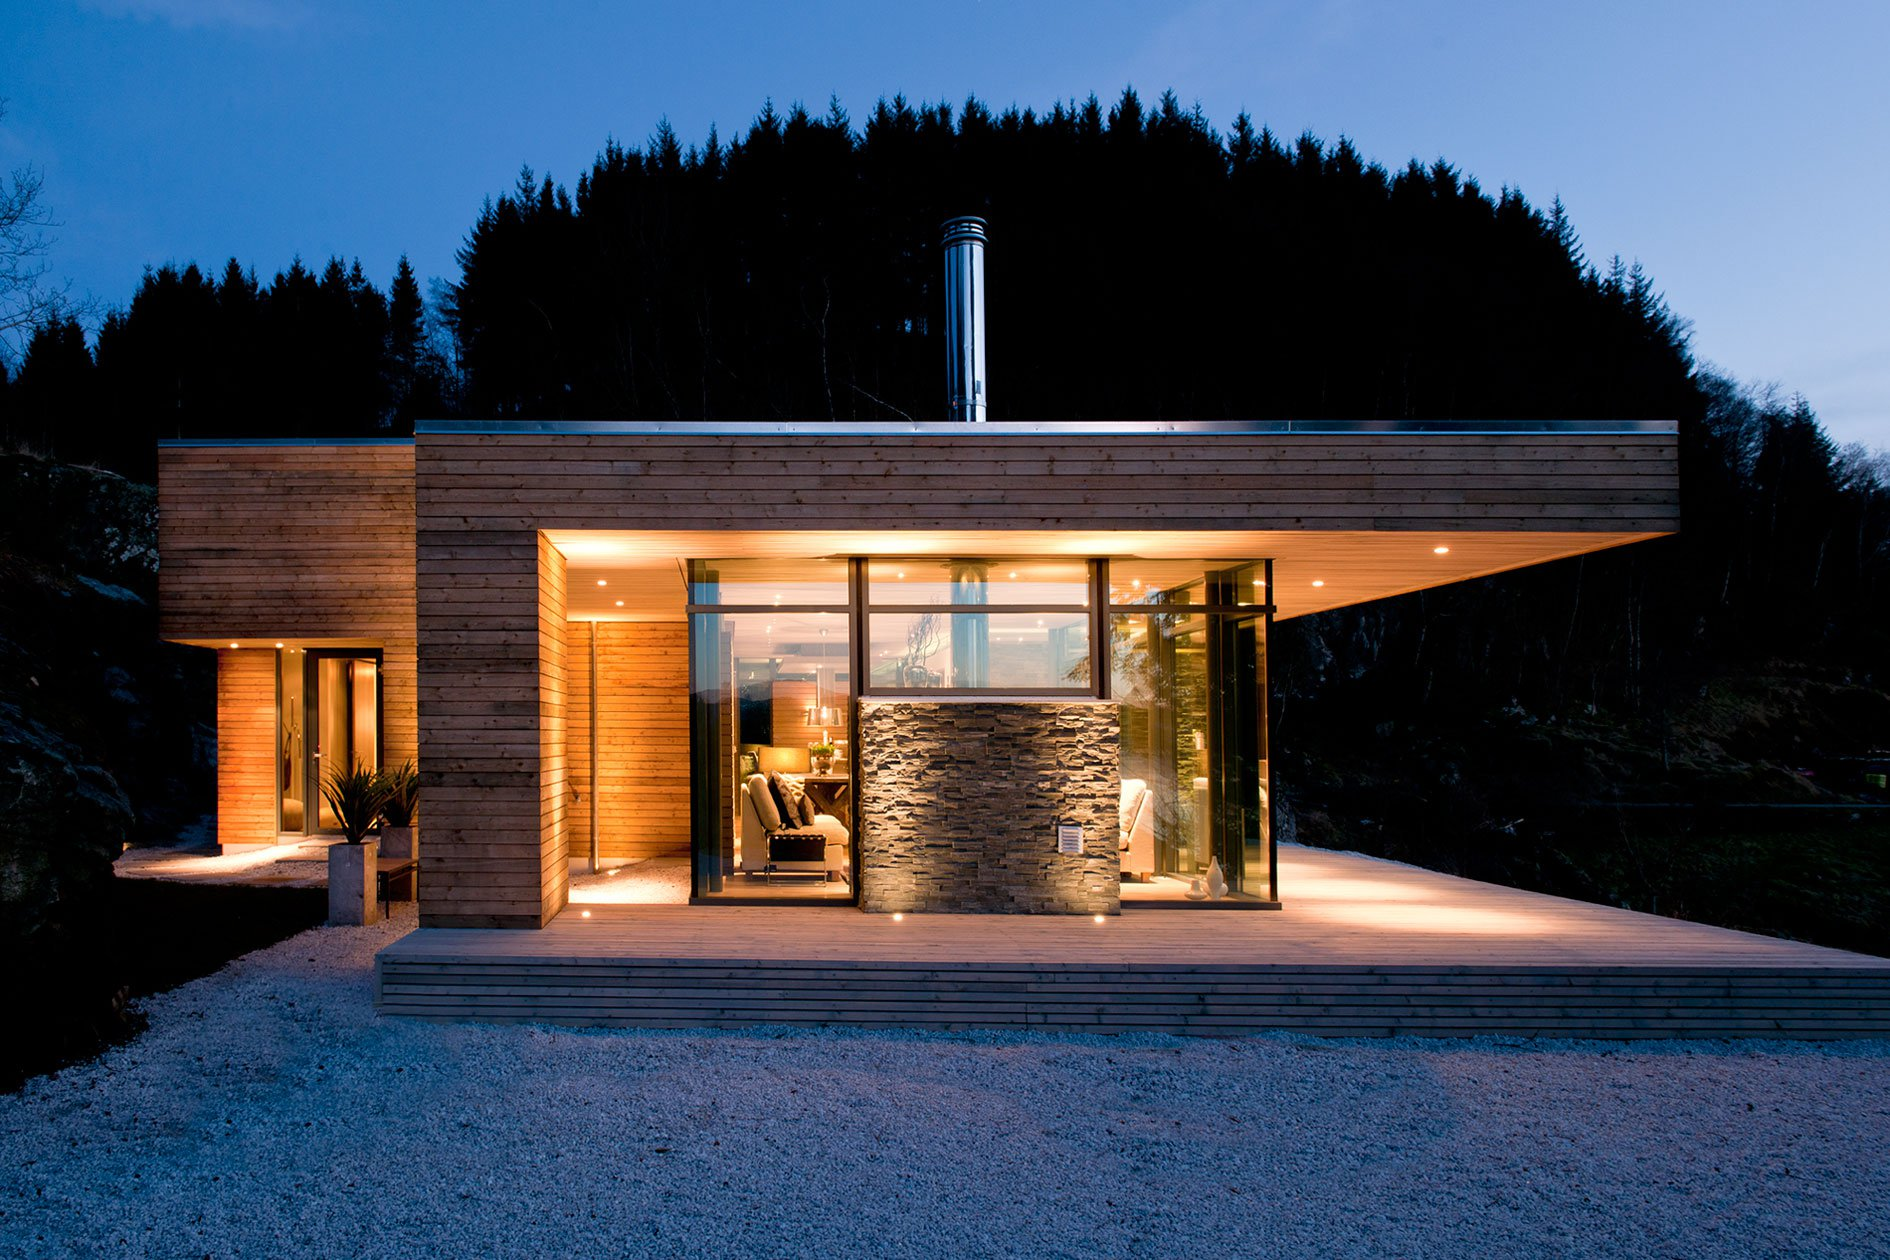 cabin gj 9 by gudmundur jonsson architect home design modern cabin gj